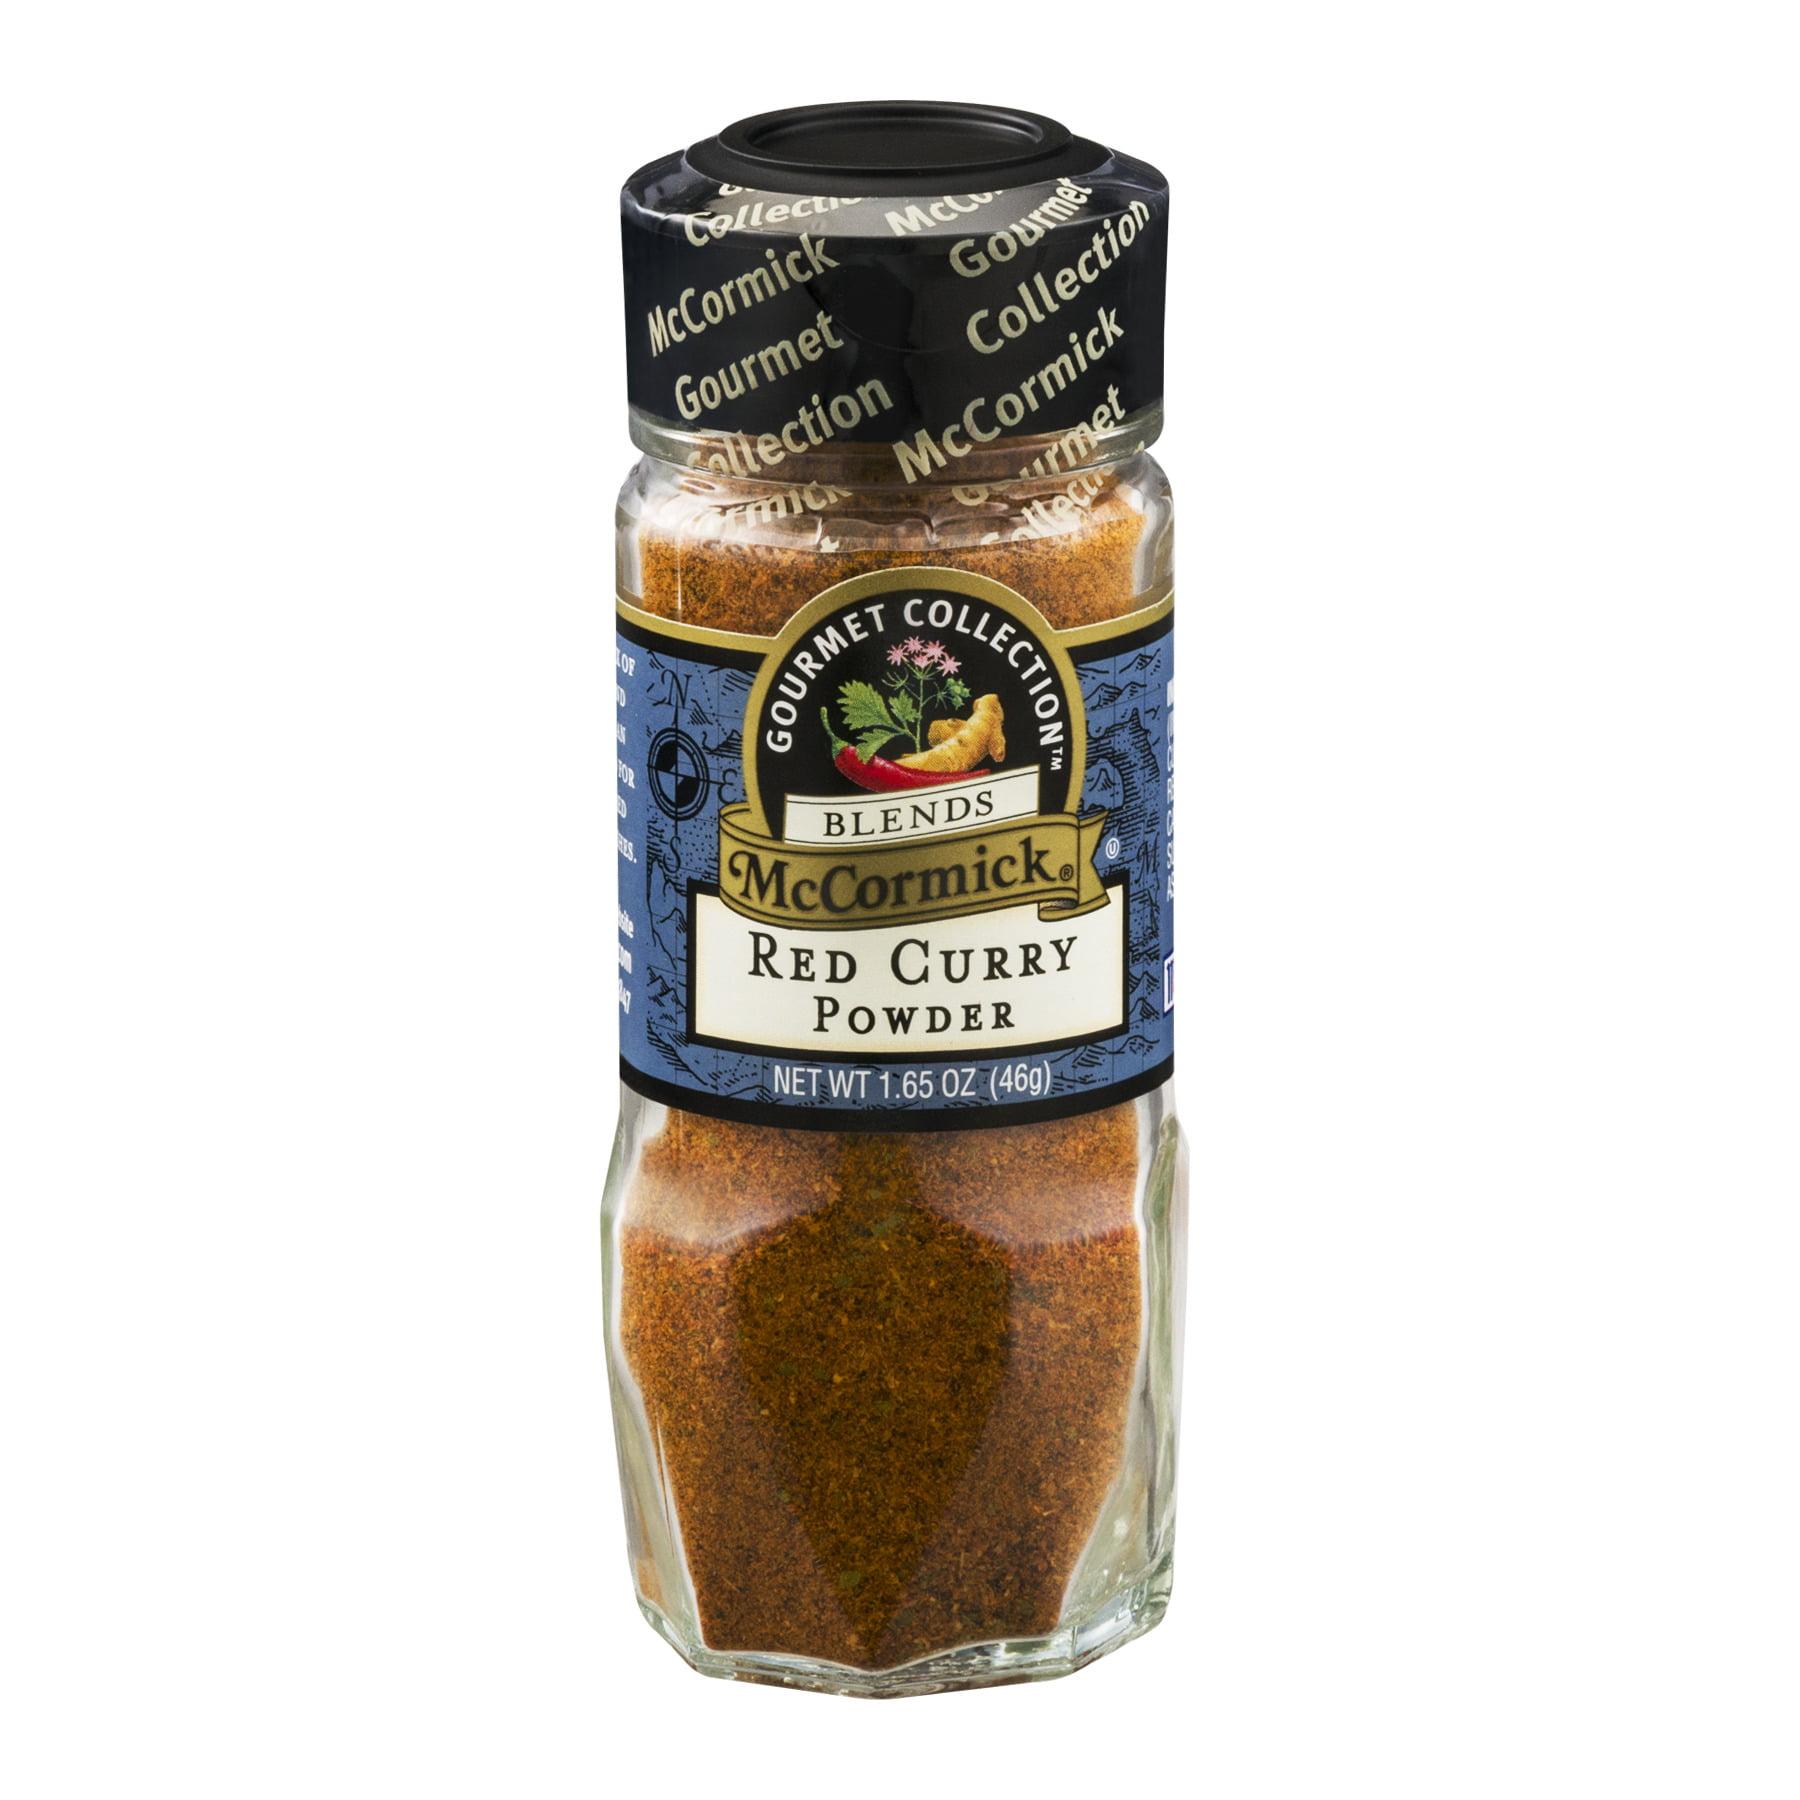 McCormick Gourmet™ Red Curry Powder 1.65 oz. Shaker - Walmart.com